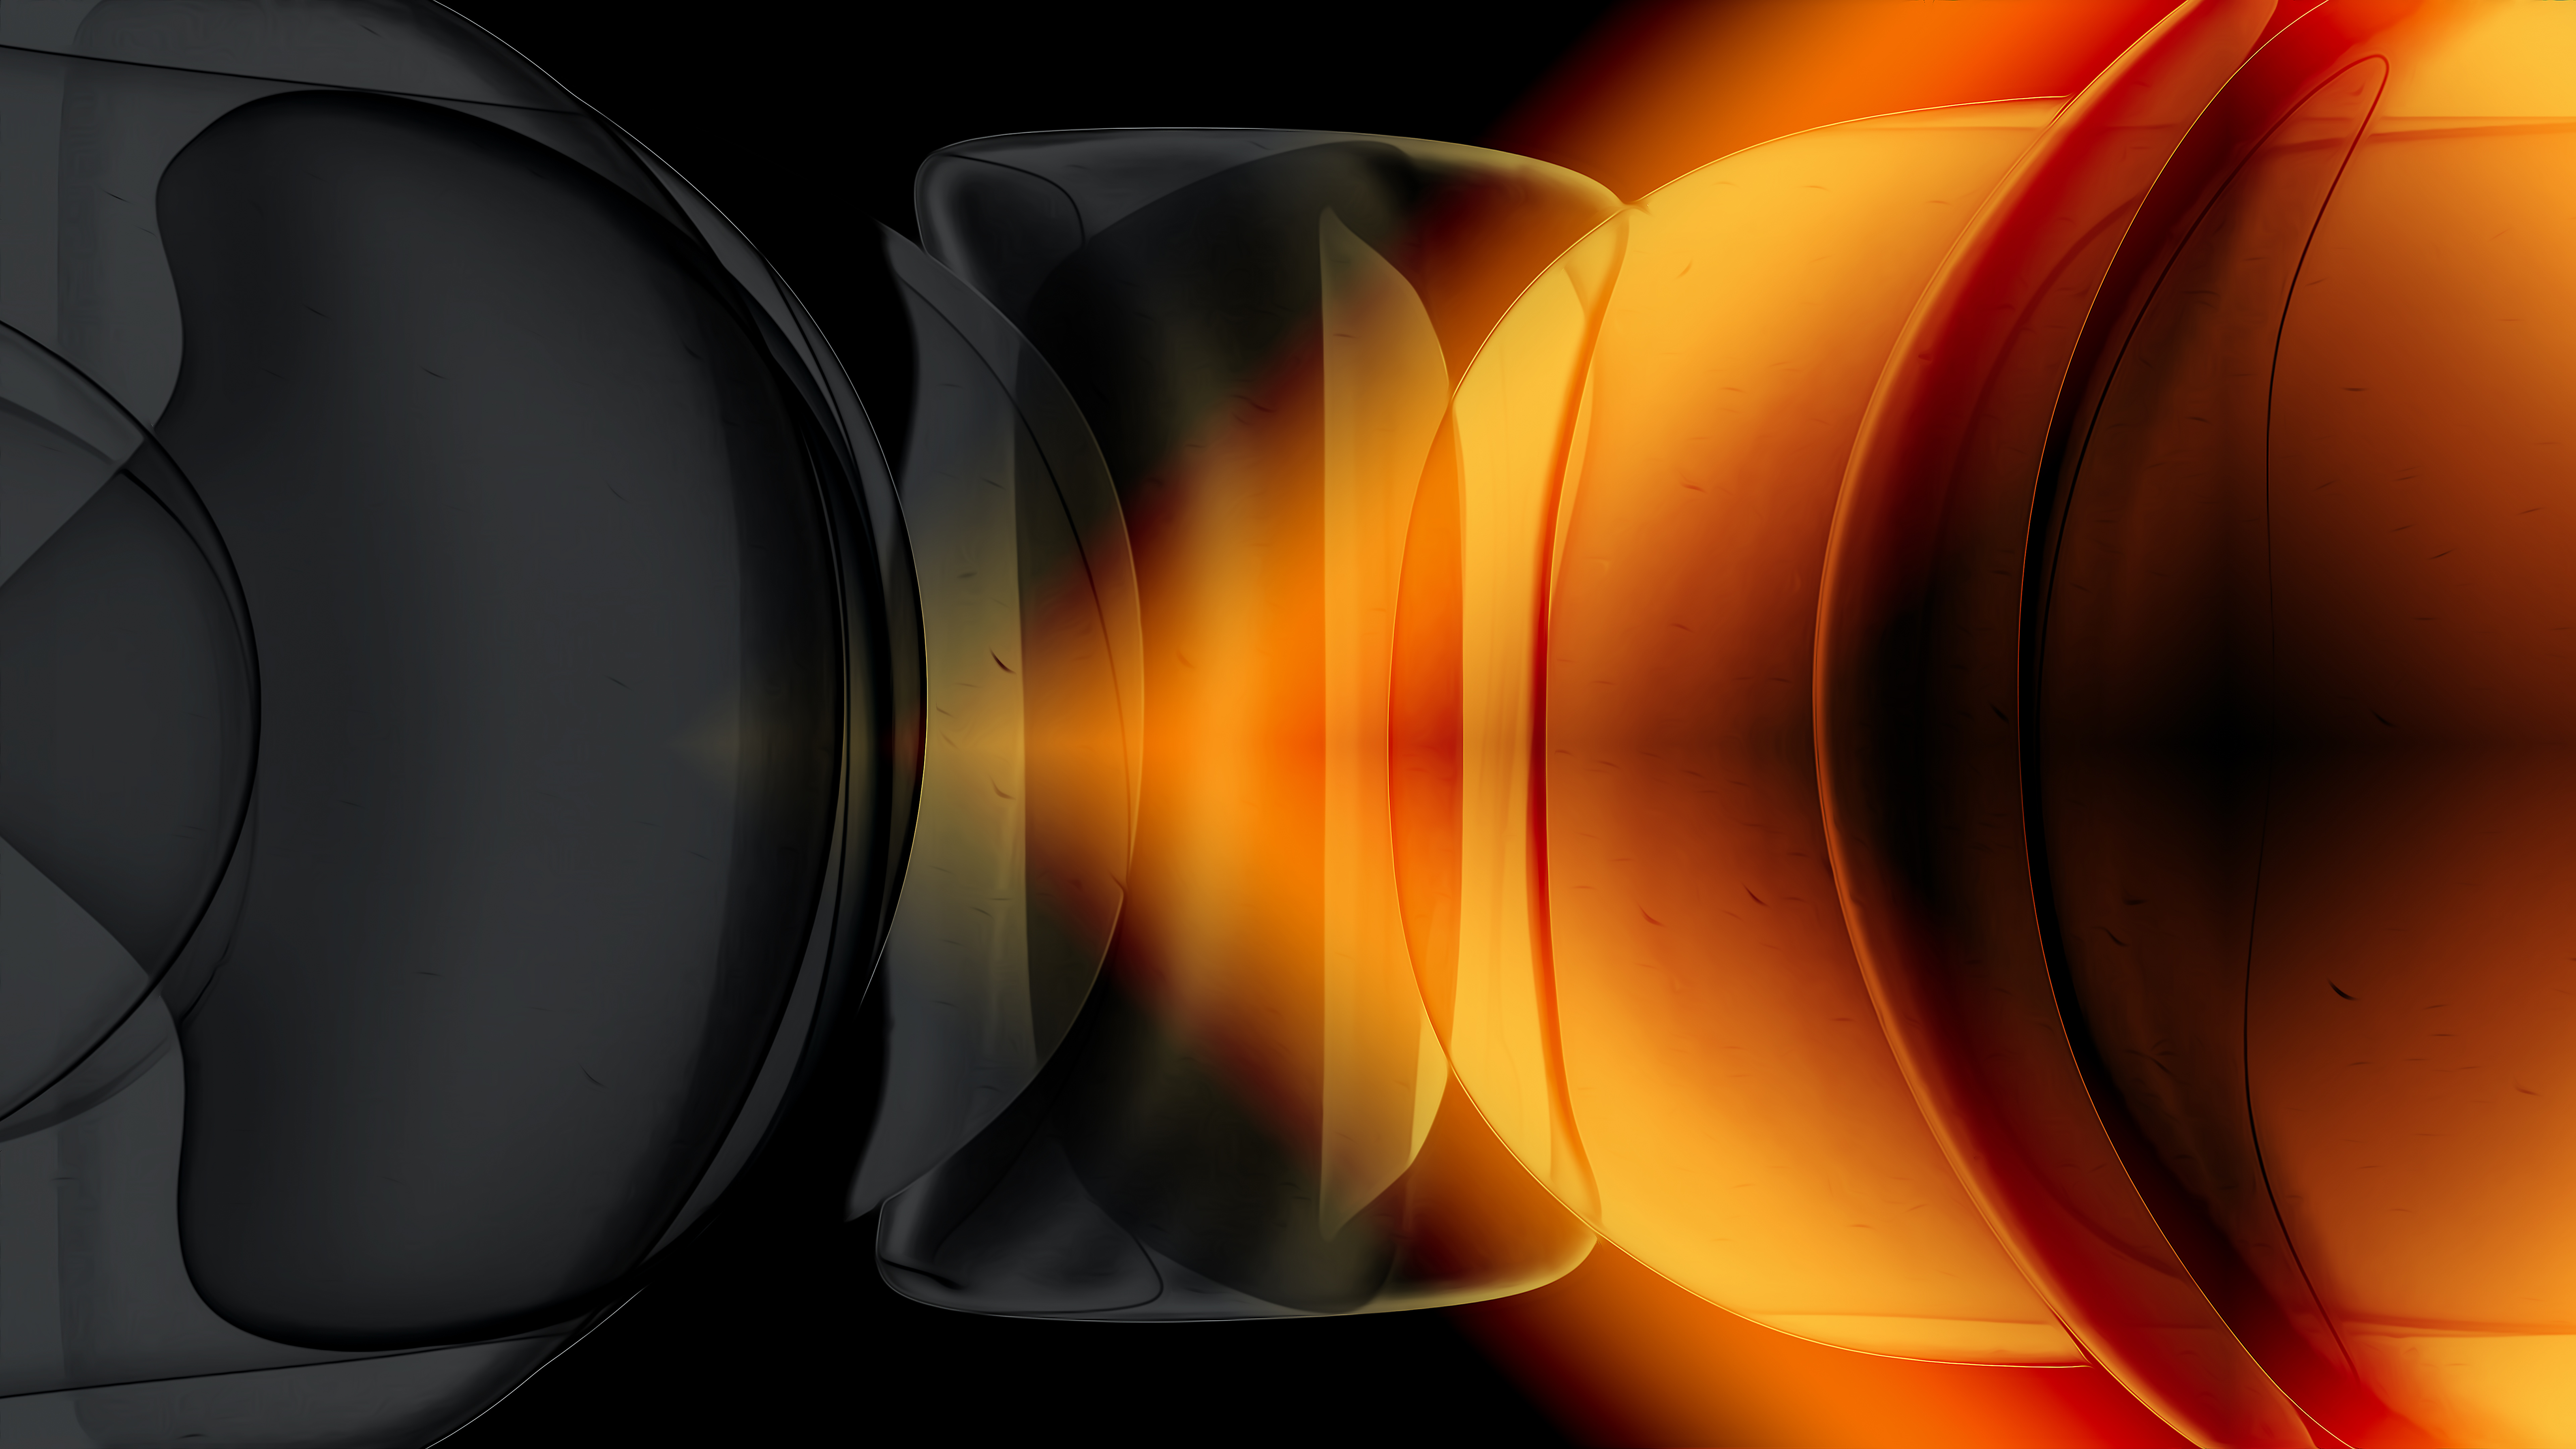 Fondos de pantalla Burbujas en diferentes figuras geometricas